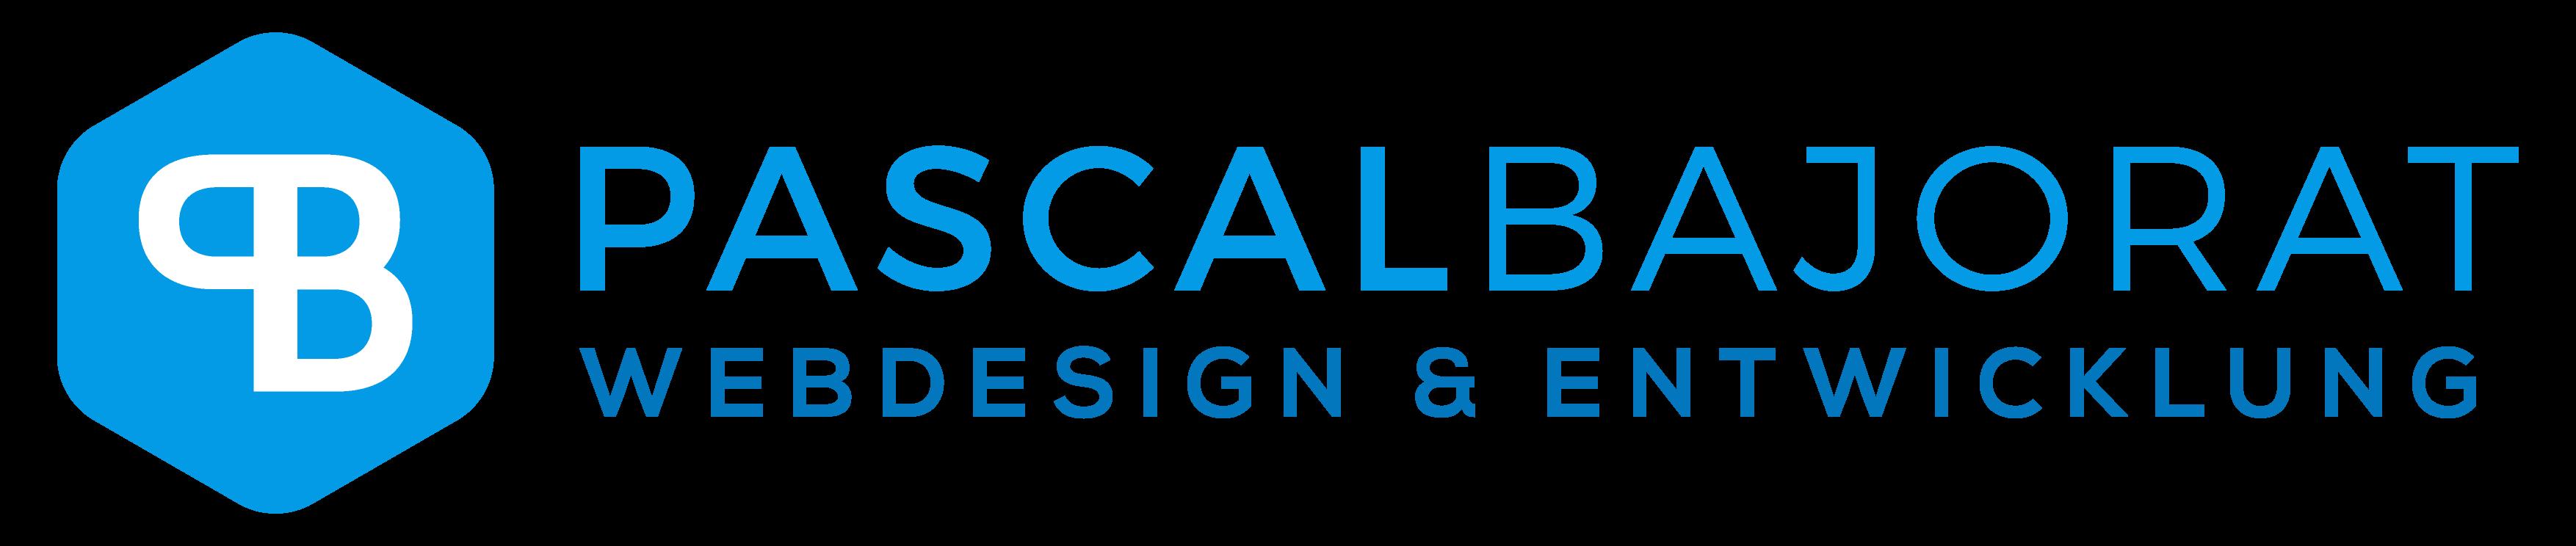 Pascal Bajorat – Webdesign & Entwicklung